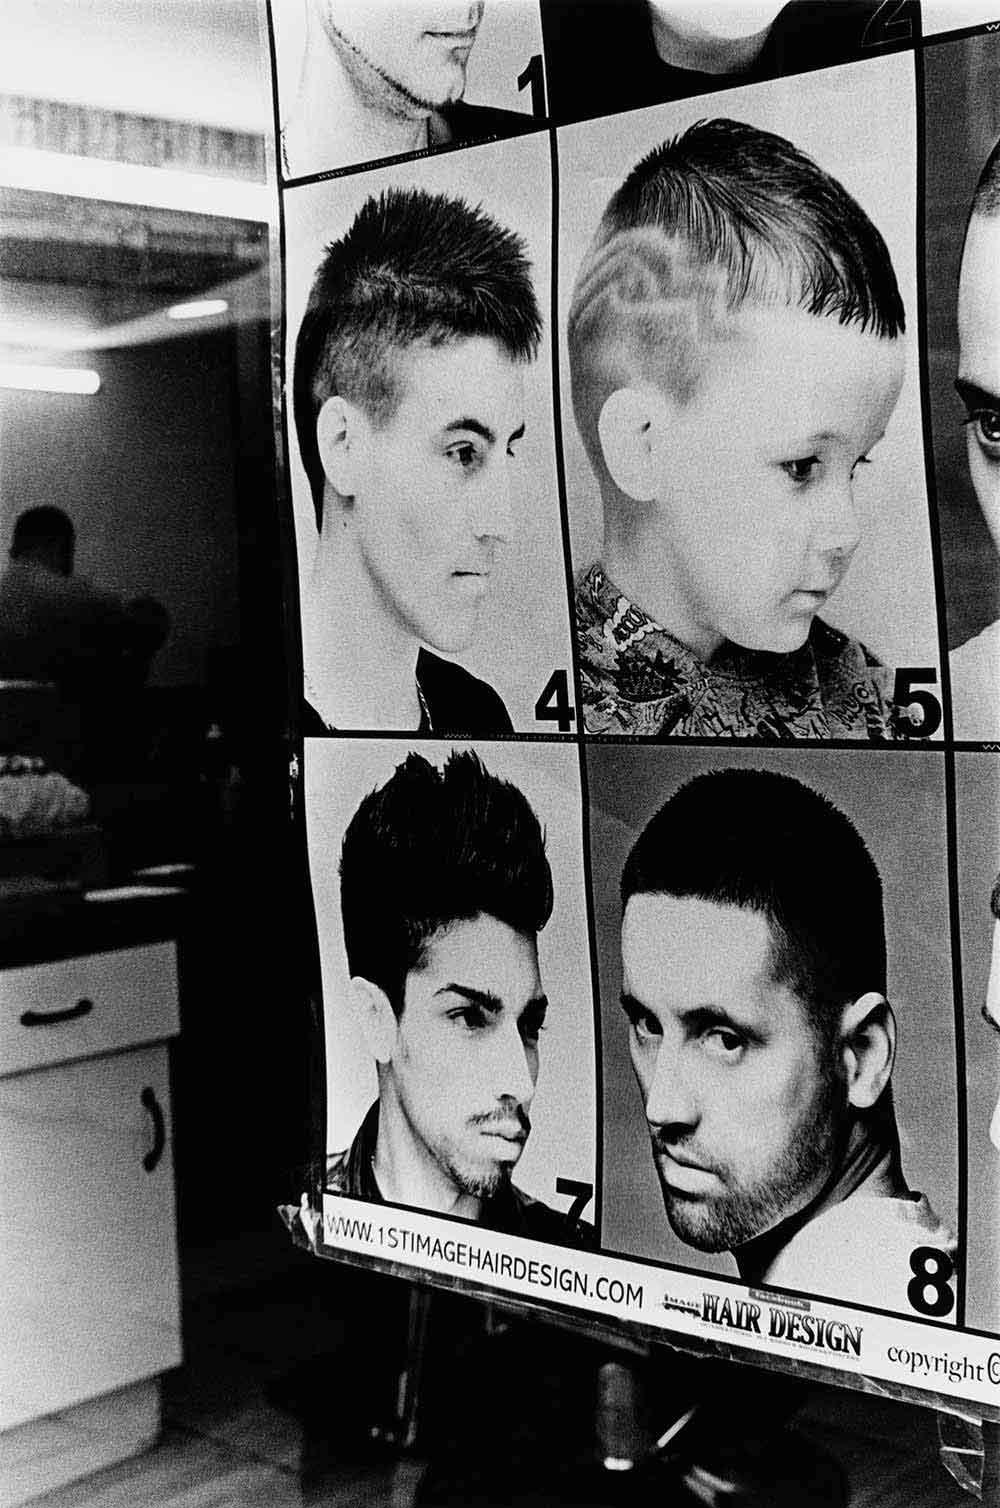 Barber shop, part of a series of photographs by Stephie Devred that captures the unique spirit of the East London street market, Roman Road Market.